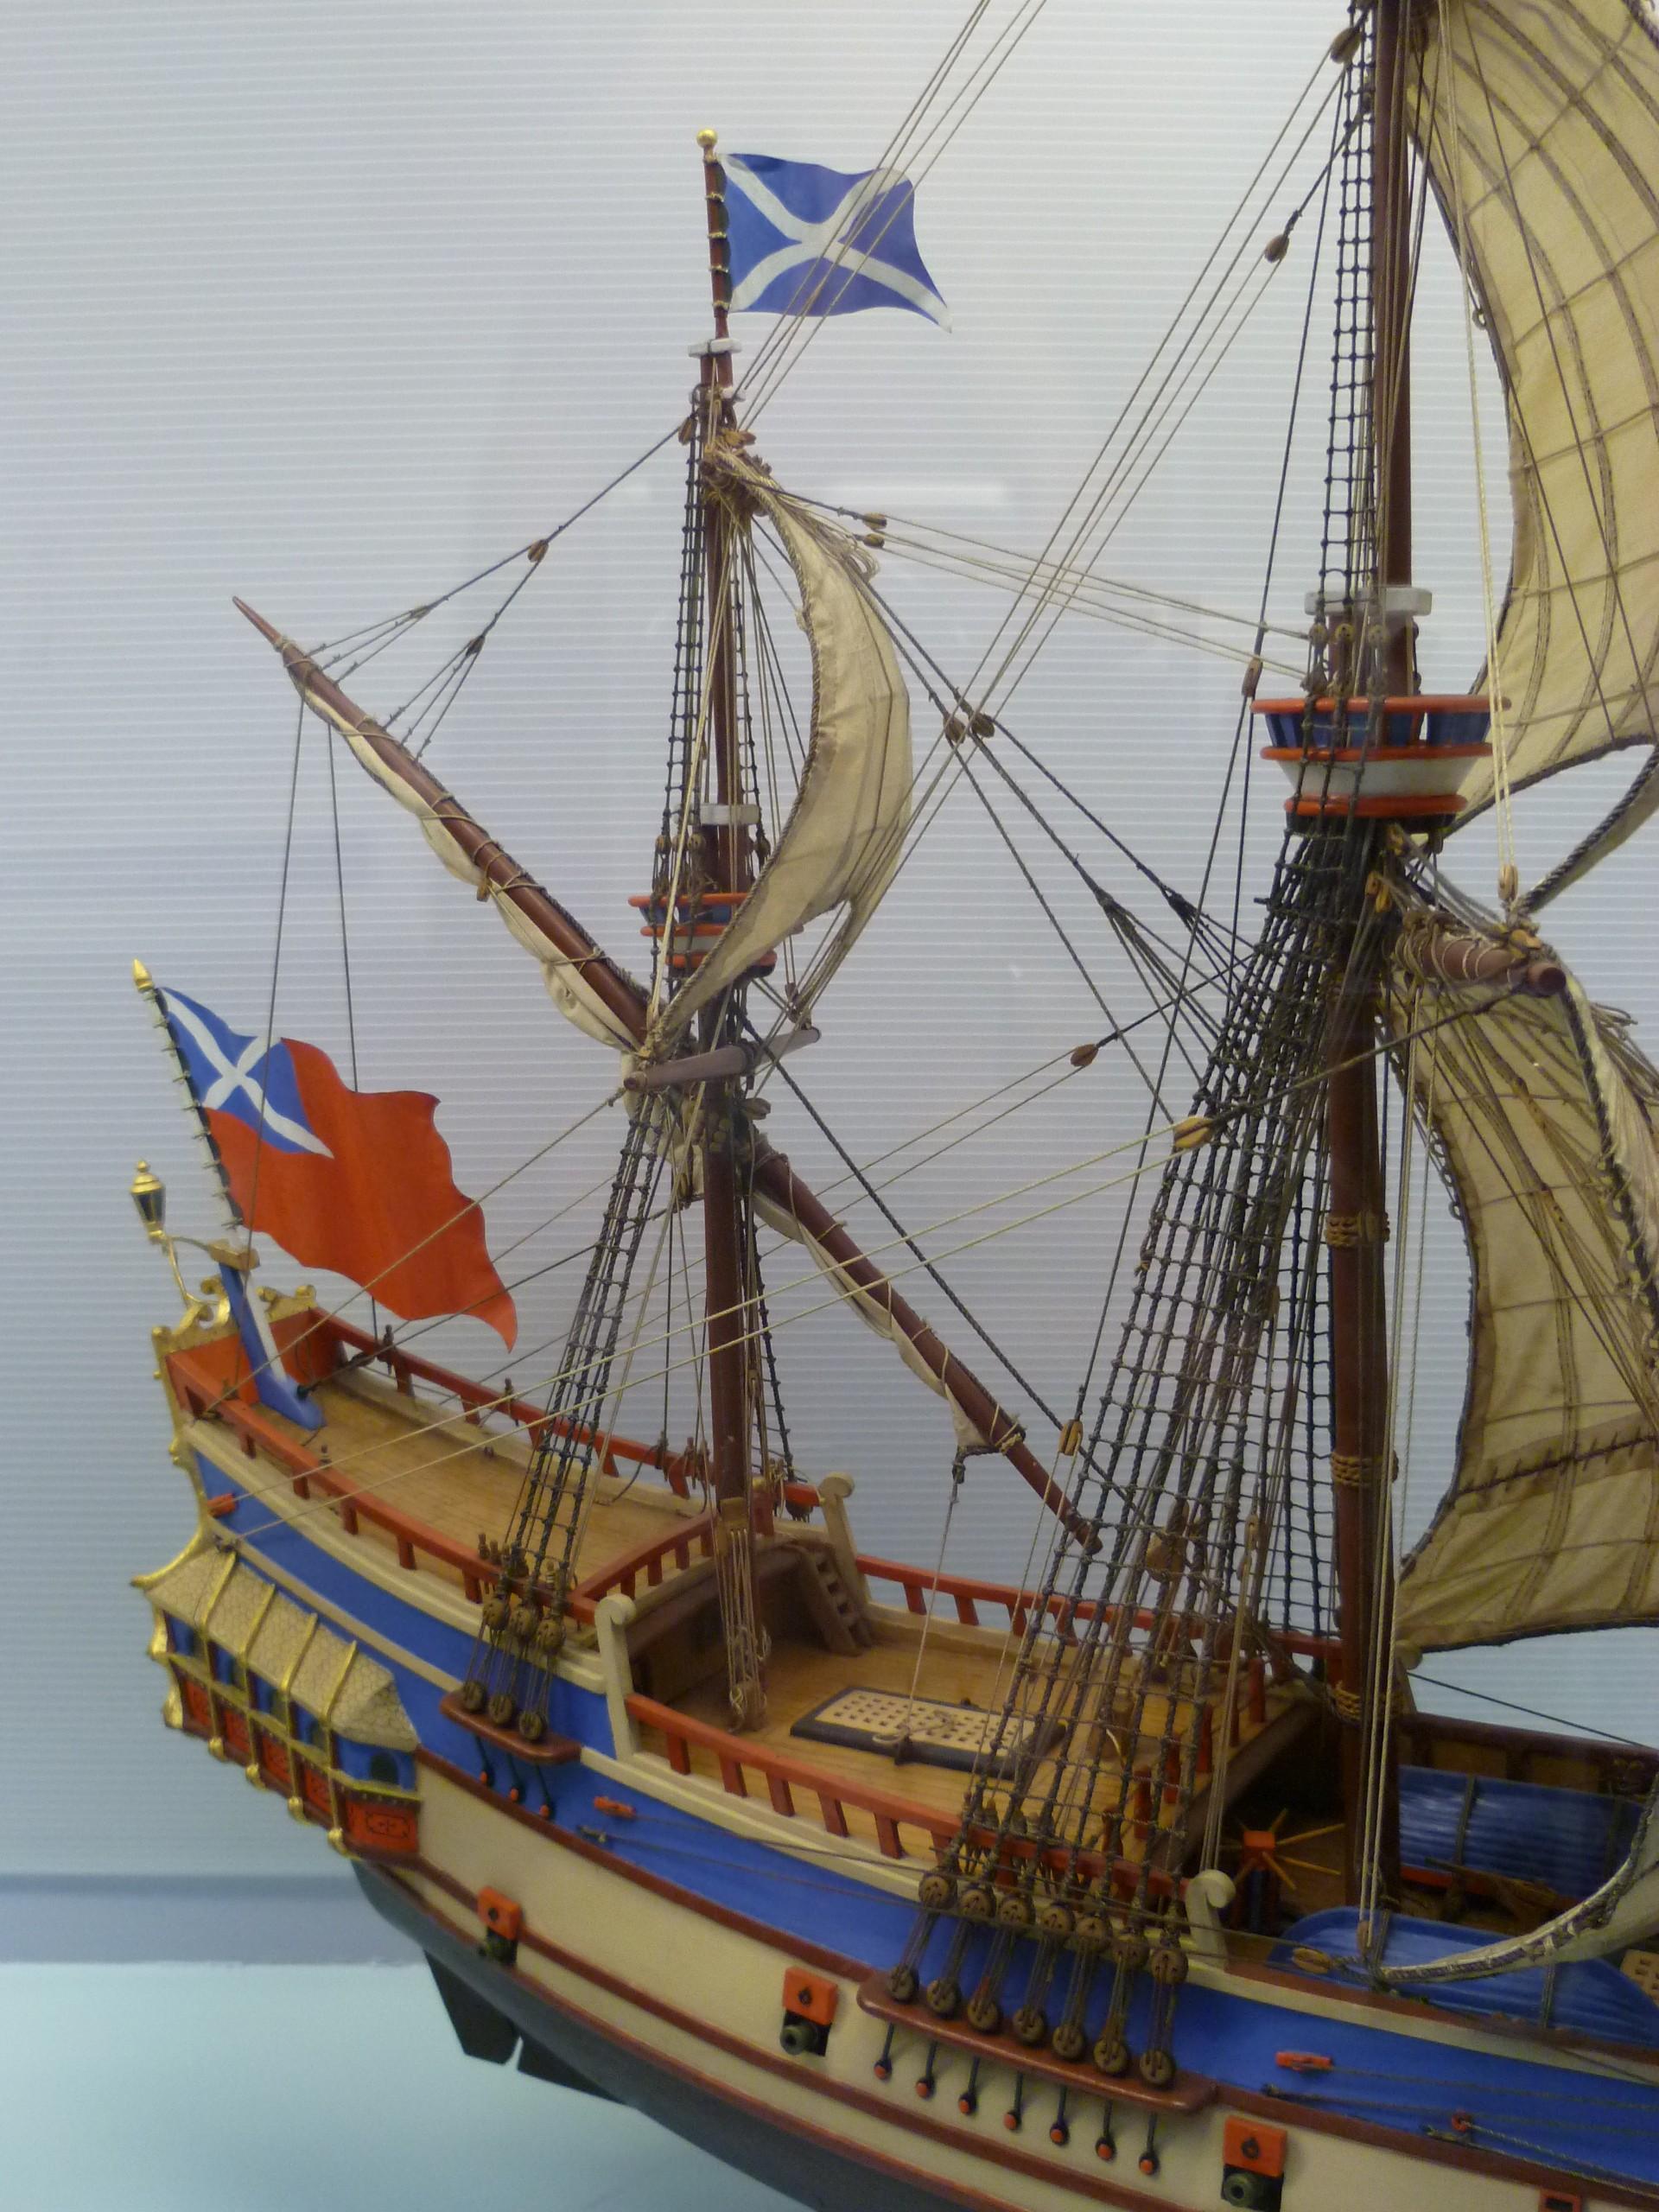 The_Red_Ensign_flown_on_a_mid-17thC_Scottish_merchant_ship.jpg